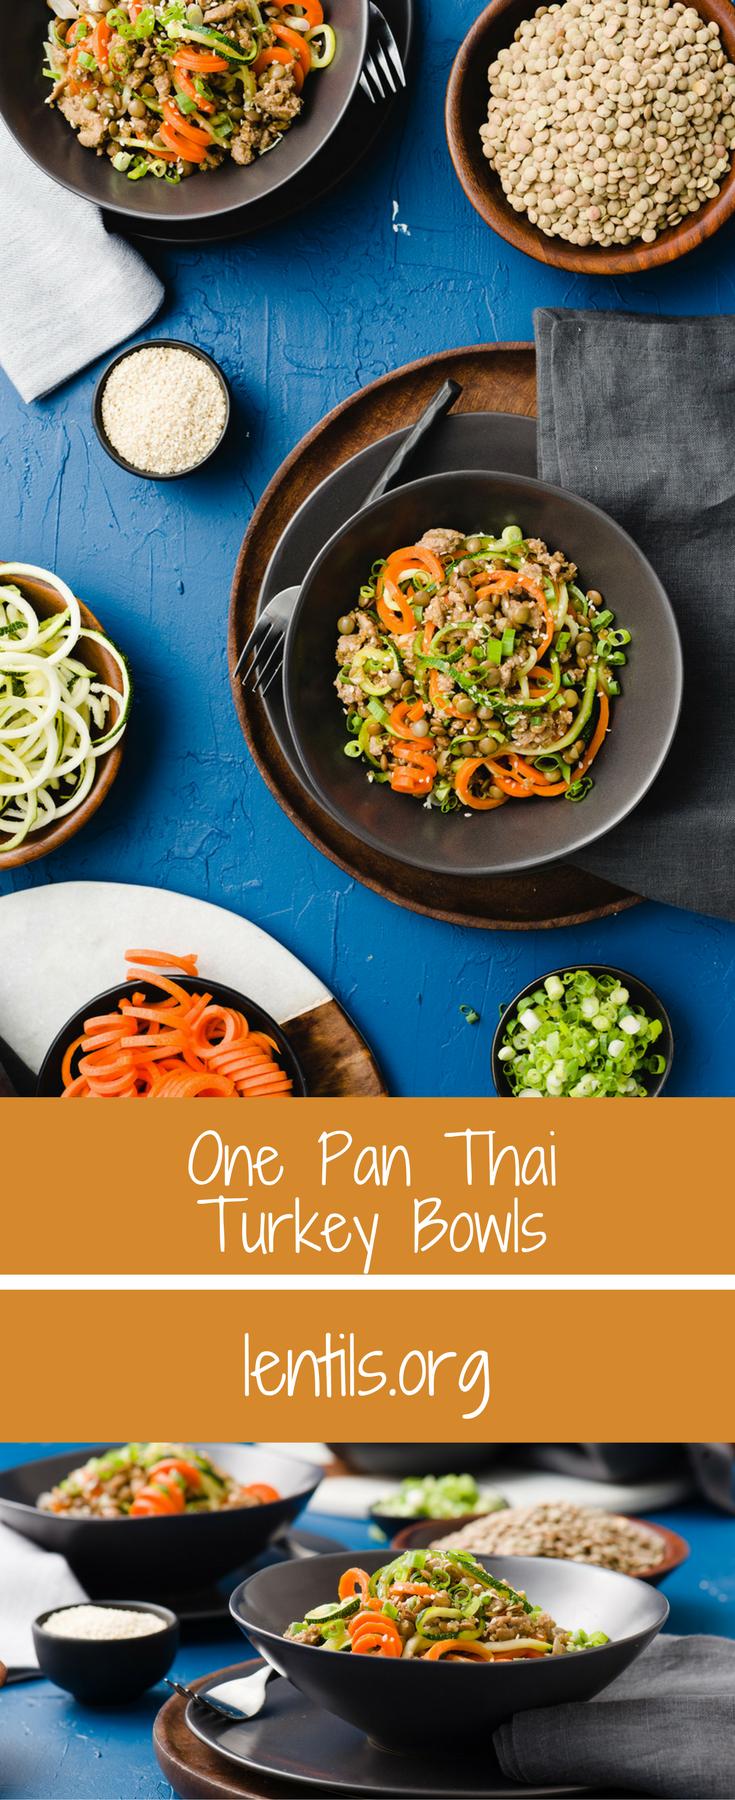 Turkey Cooking Time 15 Lbs >> One Pan Thai Turkey Bowls – Lentils.org